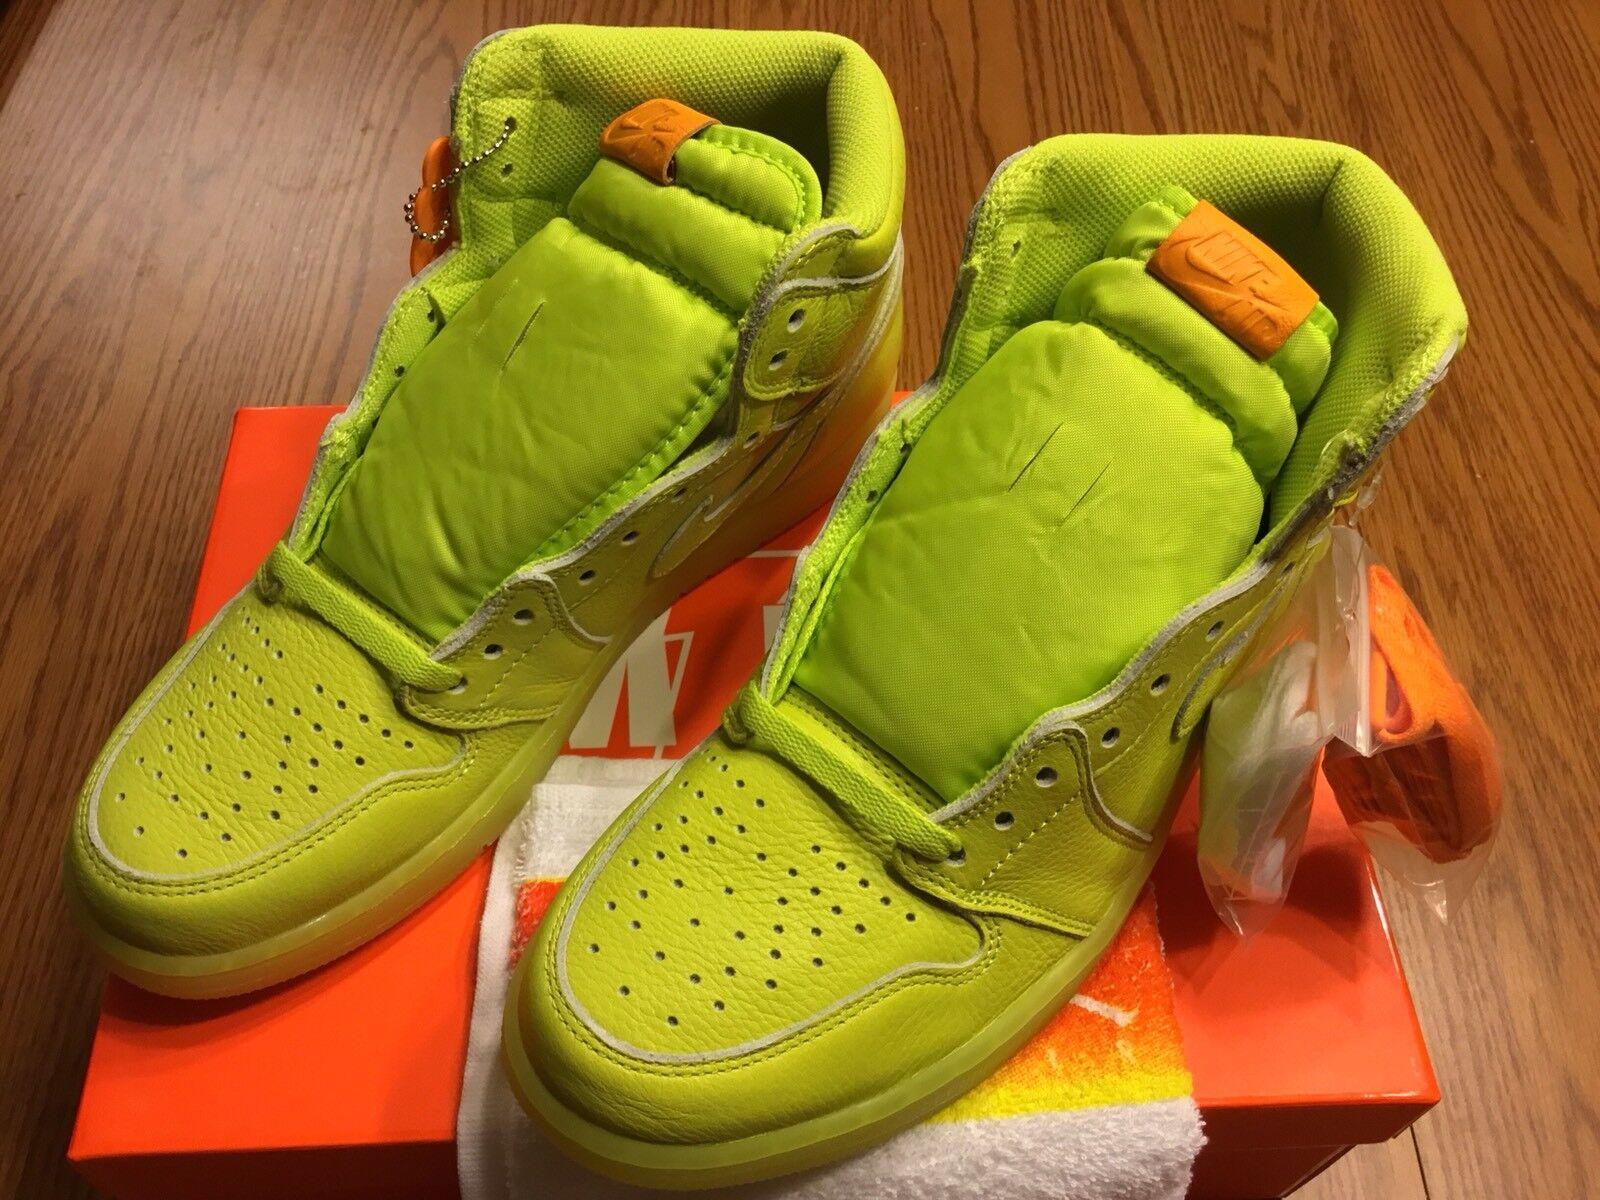 Air Jordan 1 Retro High Gatorade Sz 10.5 Cyber Lemon Lemon Lime AJ5997-345